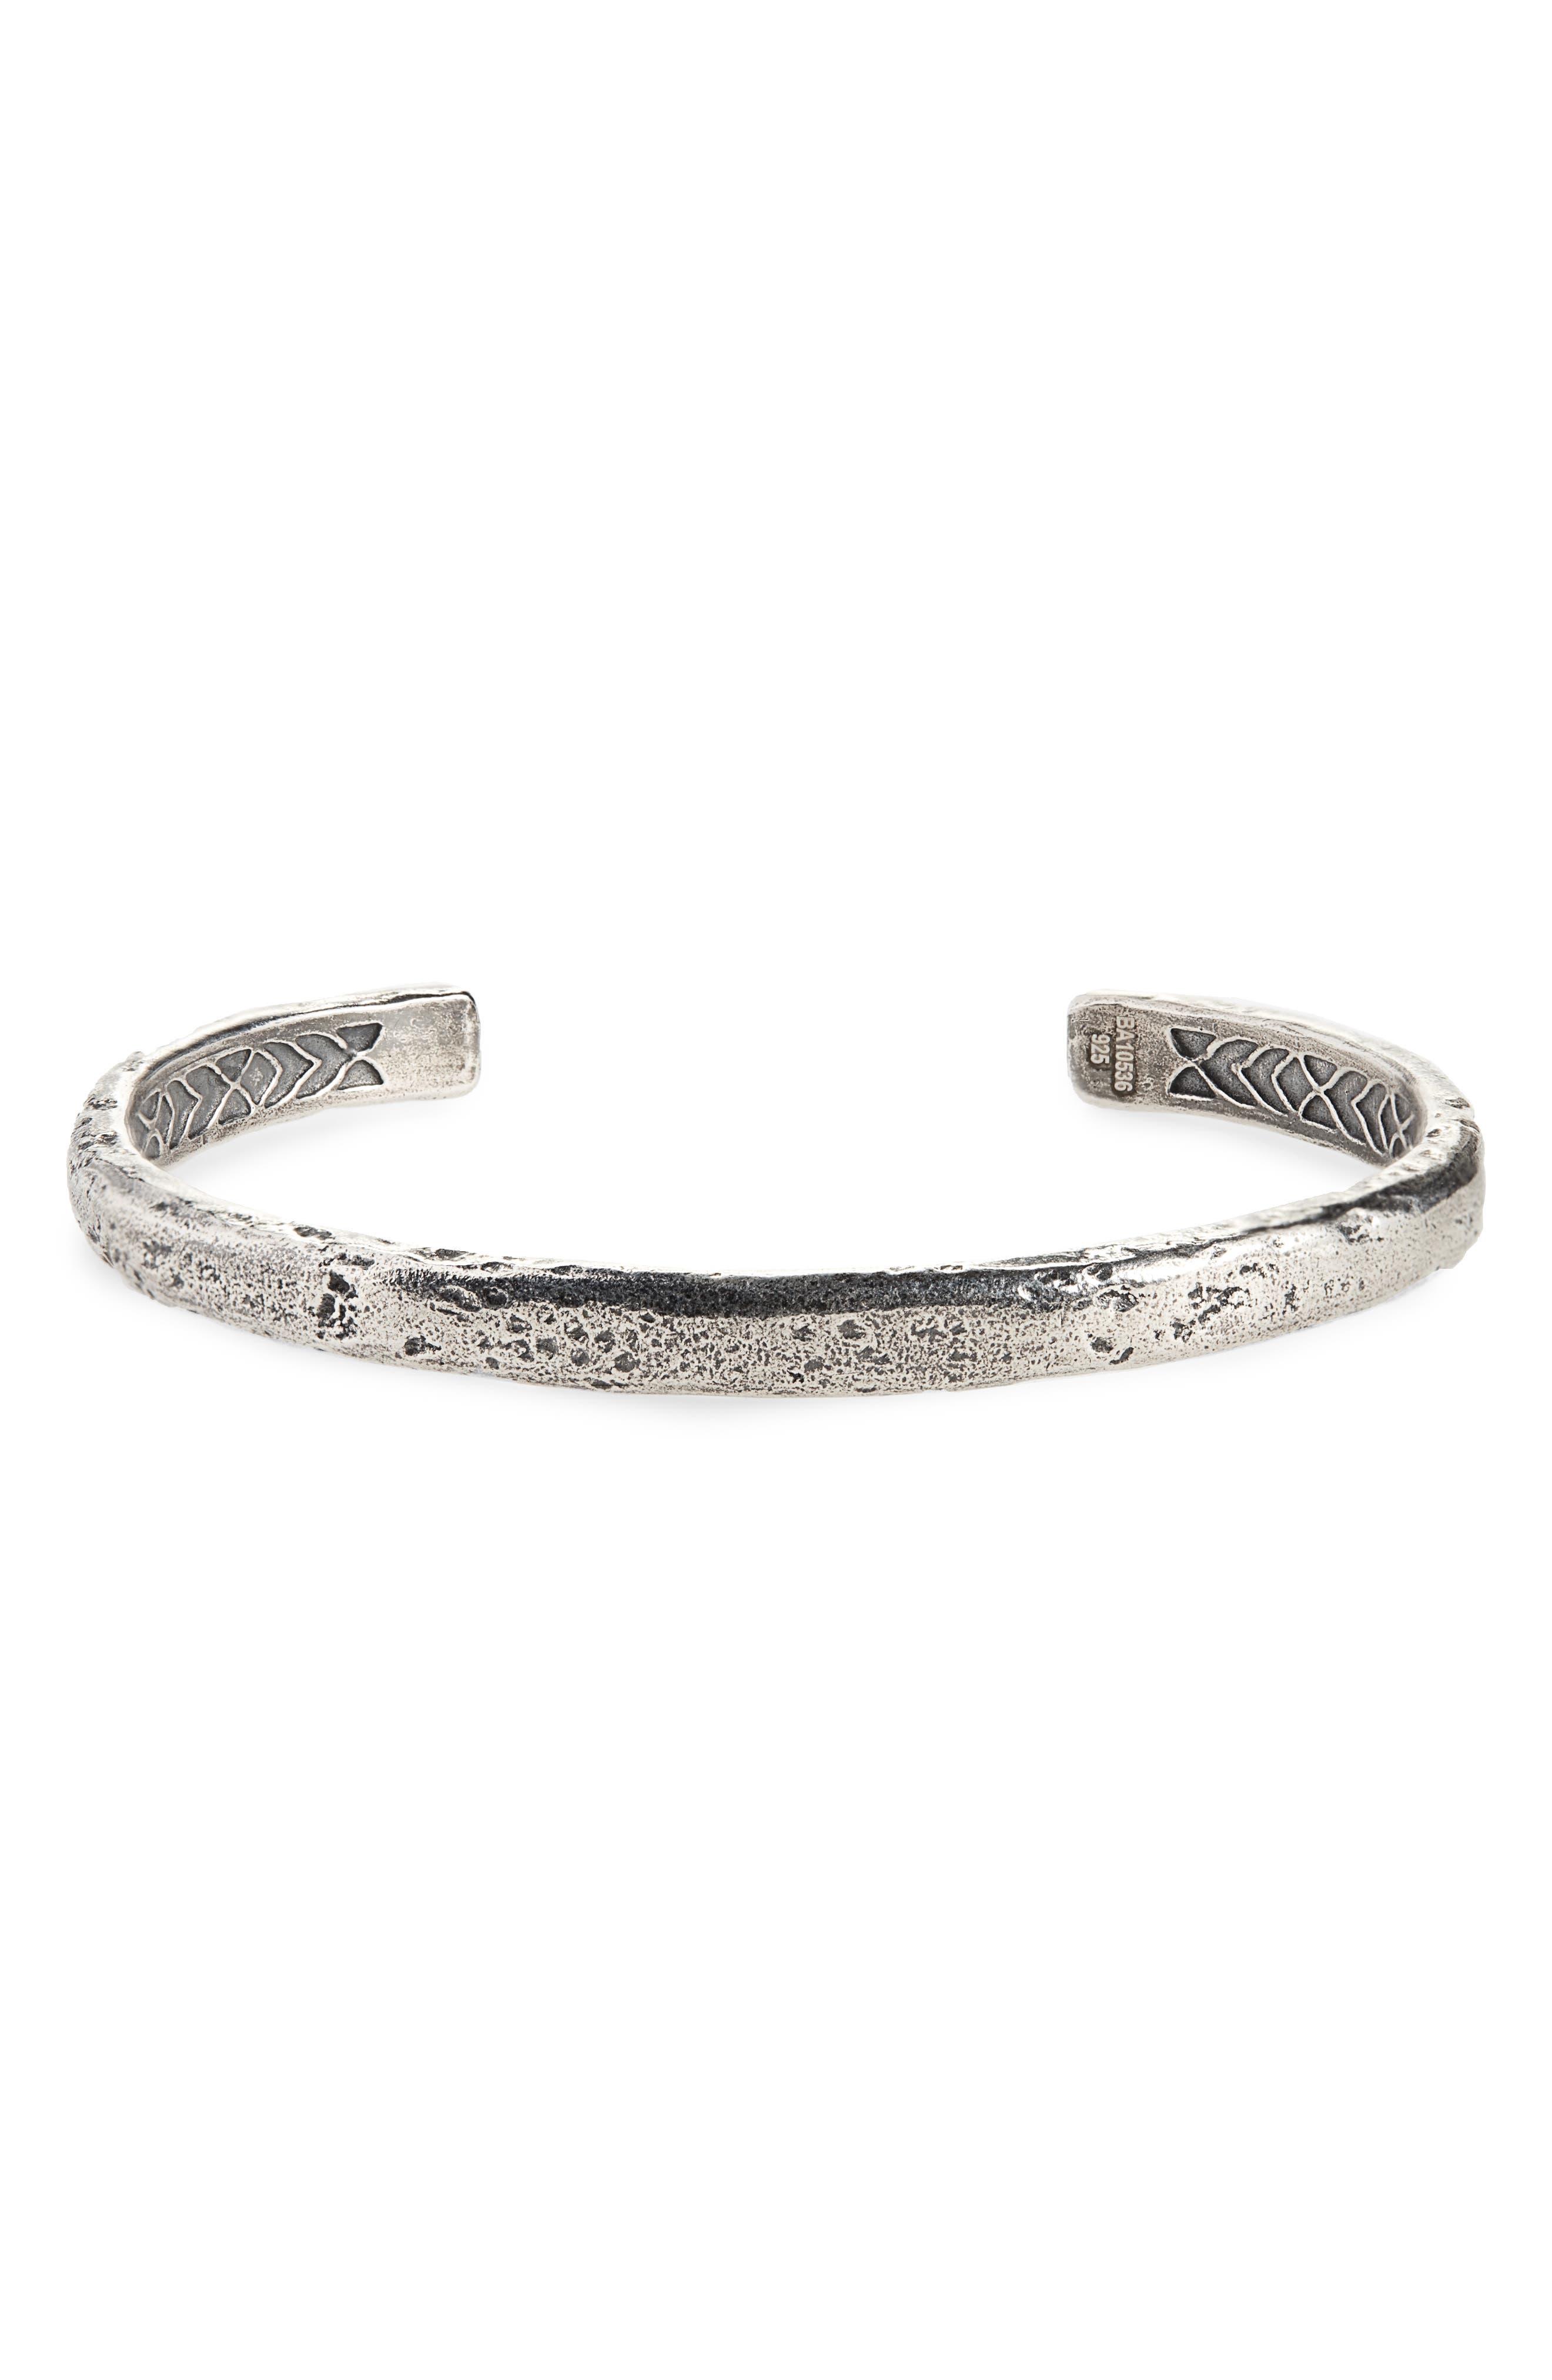 JOHN VARVATOS STAR USA Silver Cuff Bracelet, Main, color, METALLIC SILVER